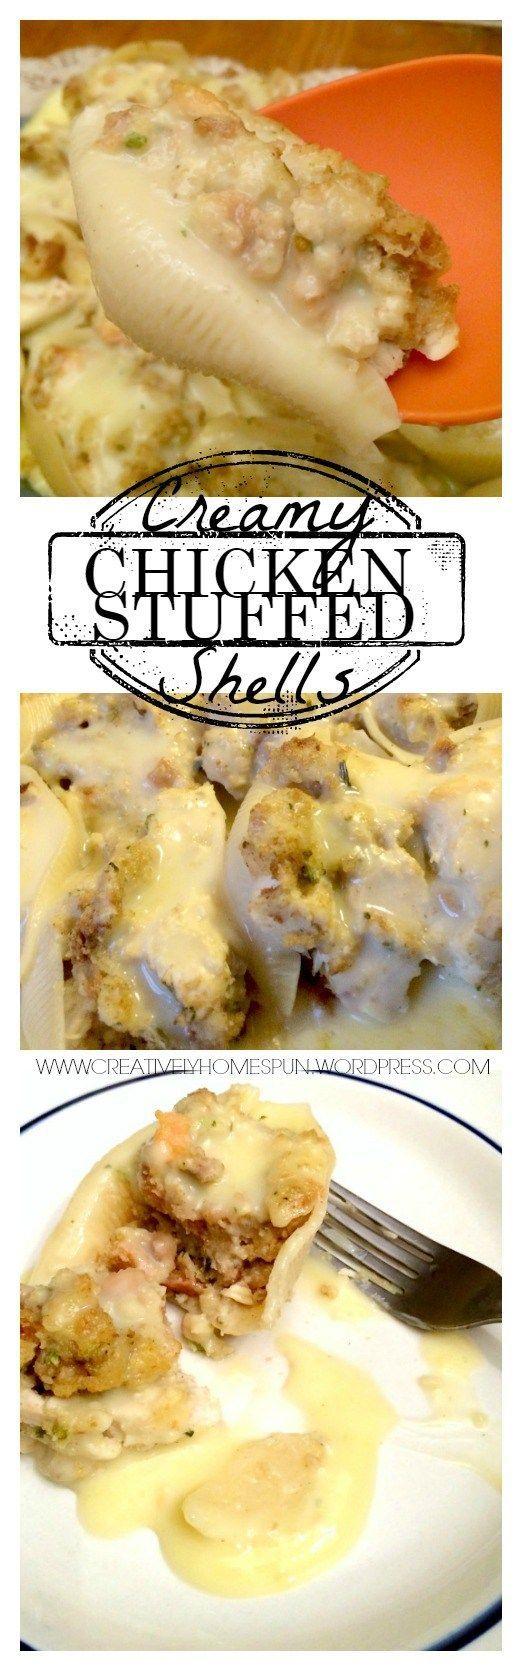 Stuffed chicken shells - Make dairy free by making gravy from almond milk, chicken broth and corn starch